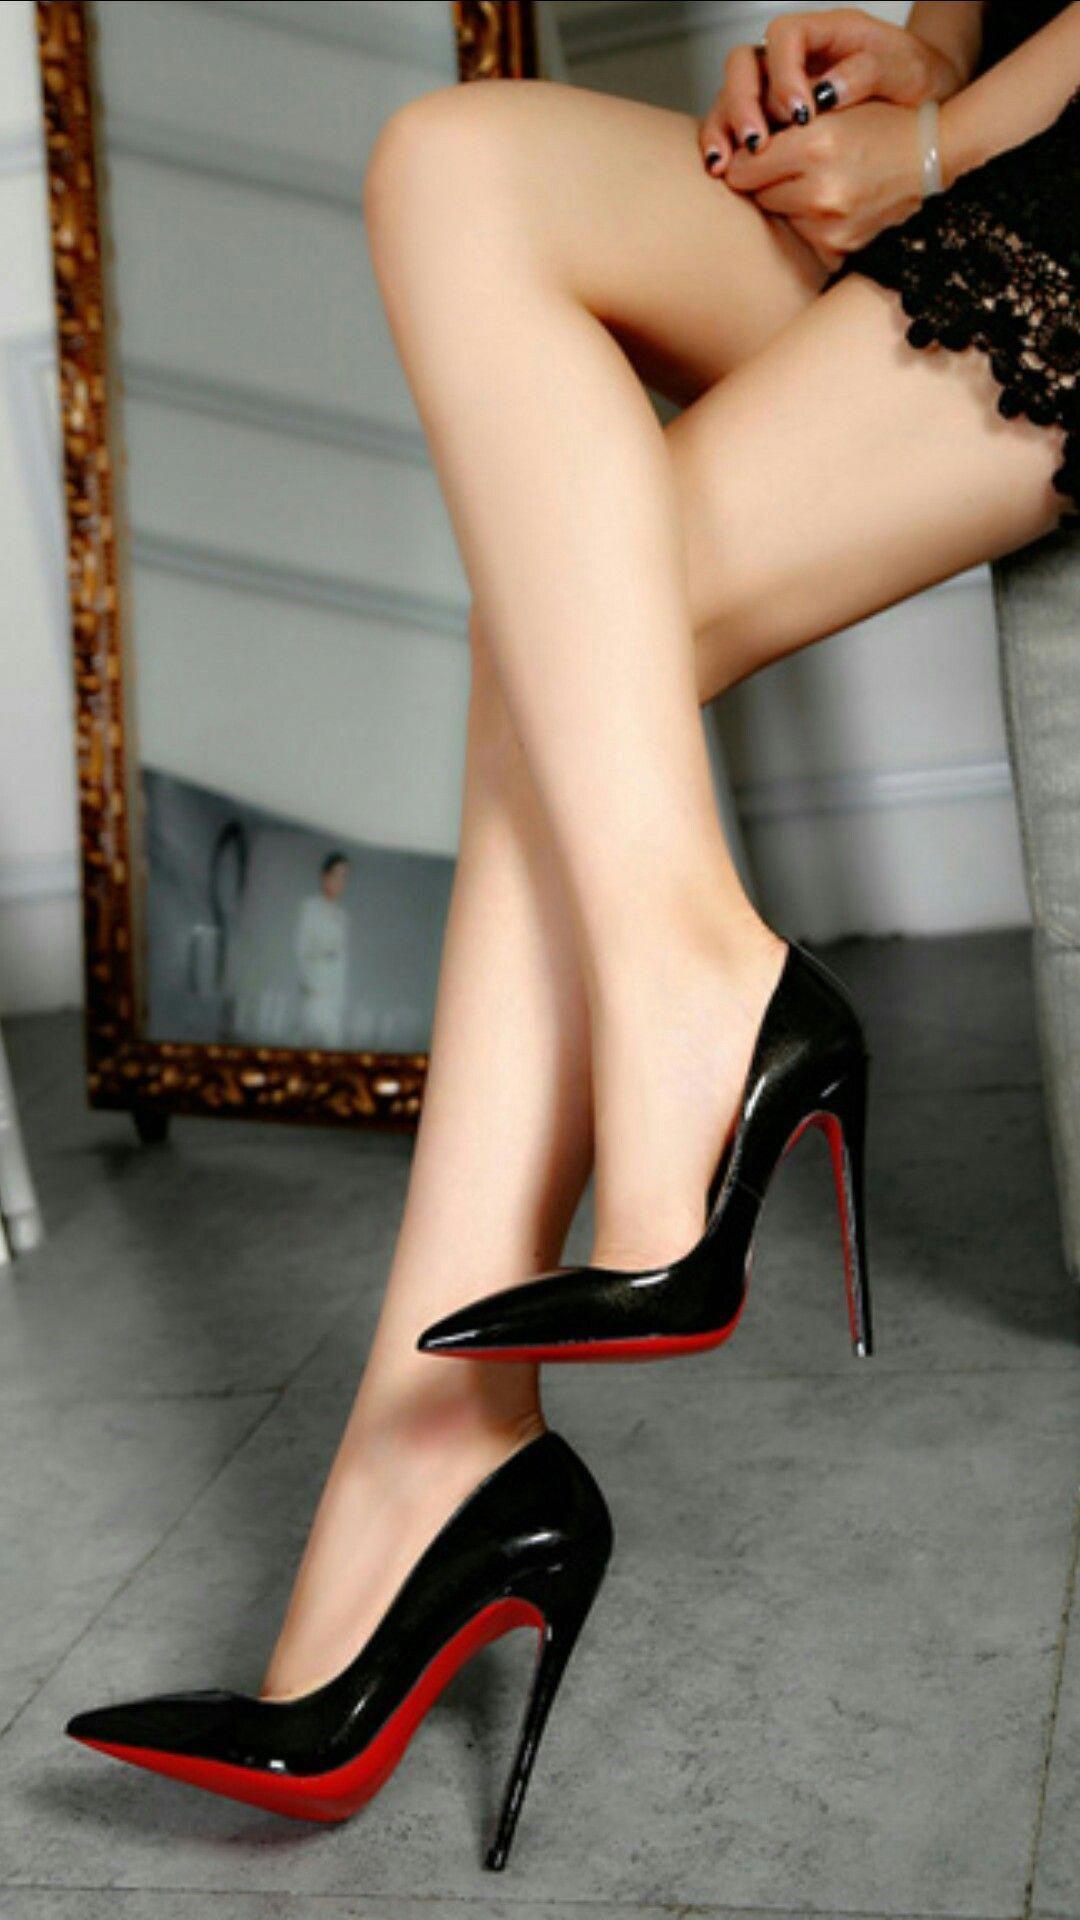 d71fff7c3ddb Great Legs and Toe Cleavage  Blackhighheels Black Stiletto Heels